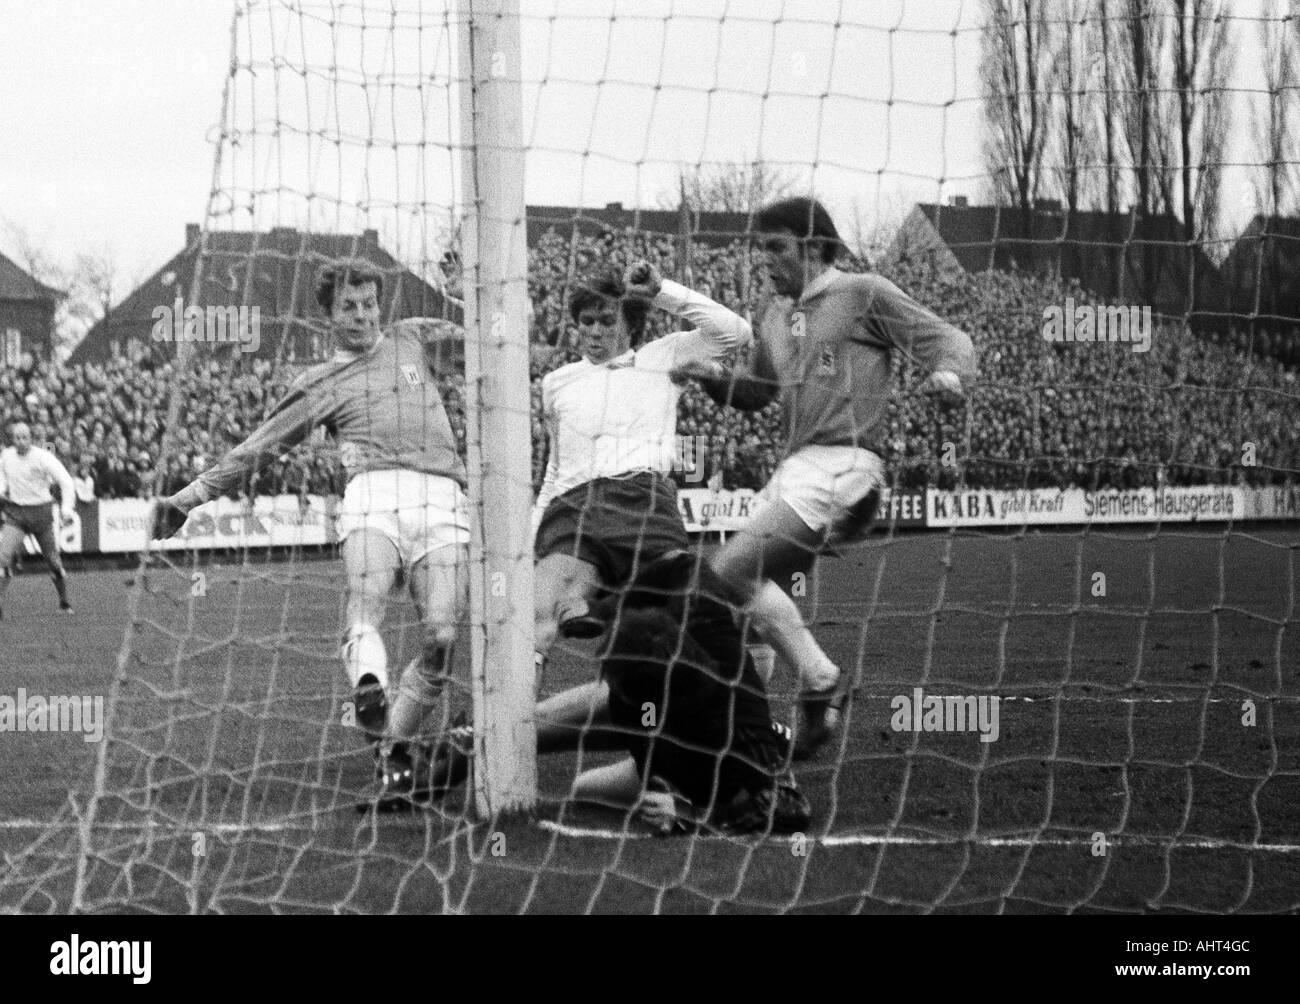 football, Bundesliga, 1970/1971, Boekelberg Stadium, Borussia Moenchengladbach versus Hamburger SV 3:0, scene of the match, f.l.t.r. Herbert Wimmer (MG), Hans Juergen Ripp, keeper Arkoc Oezcan (both HSV), Herbert Laumen (MG) - Stock Image